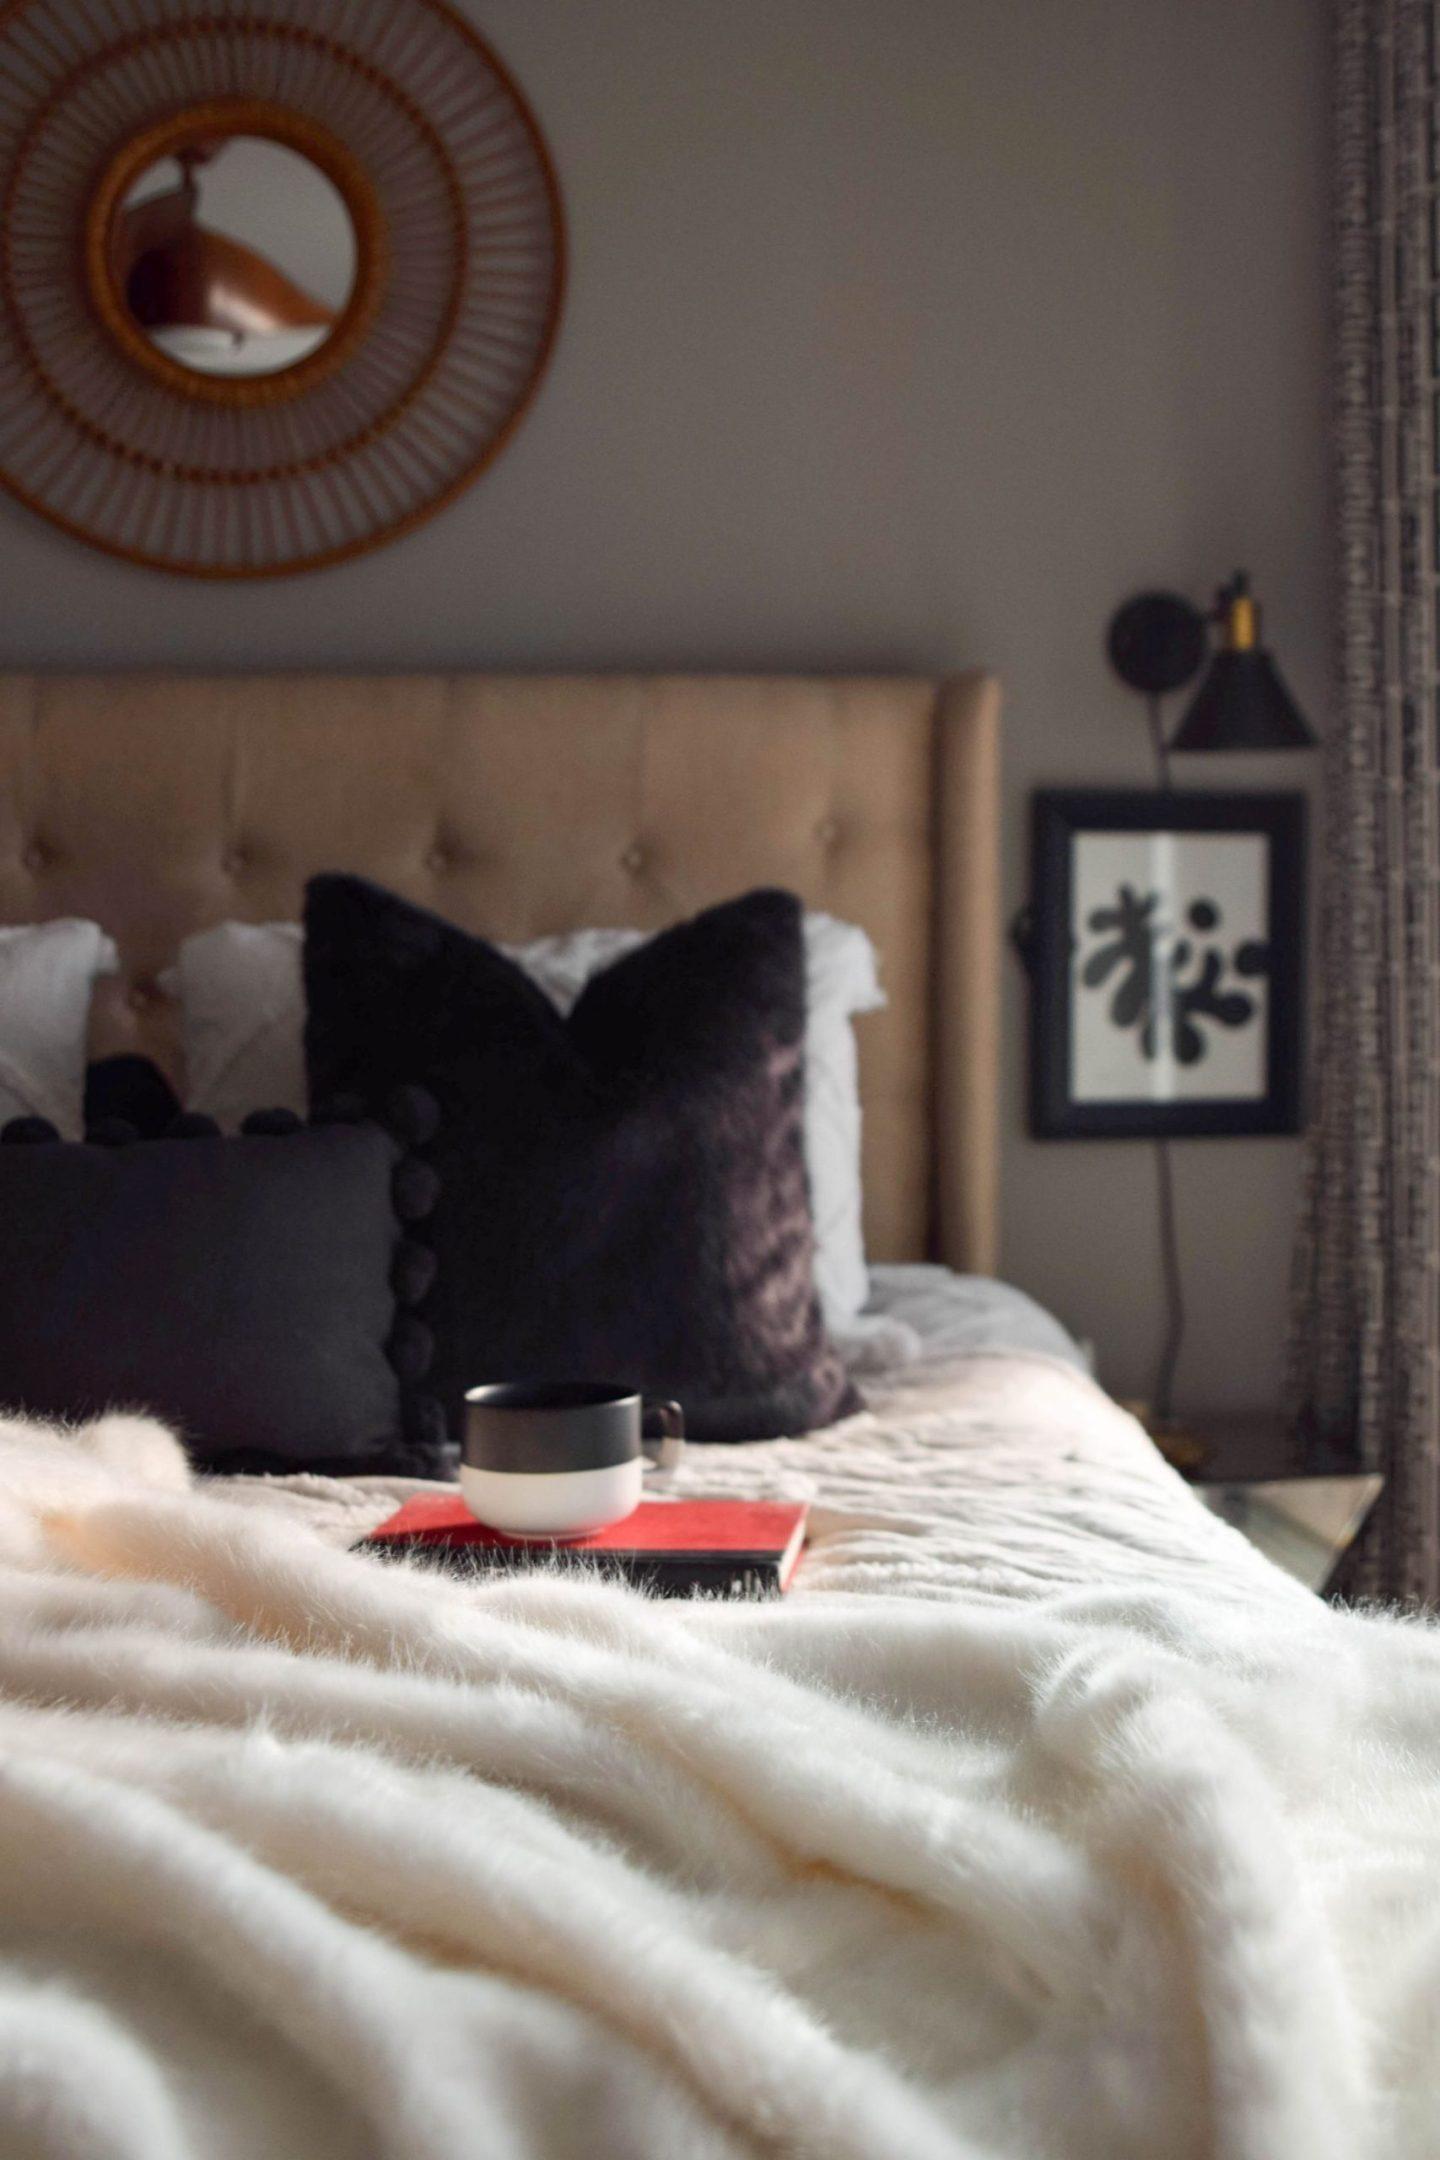 pb teen - pottery barn teen - faux fur pillow - faux fur throw - pb teen faux fur - winter bedroom updates